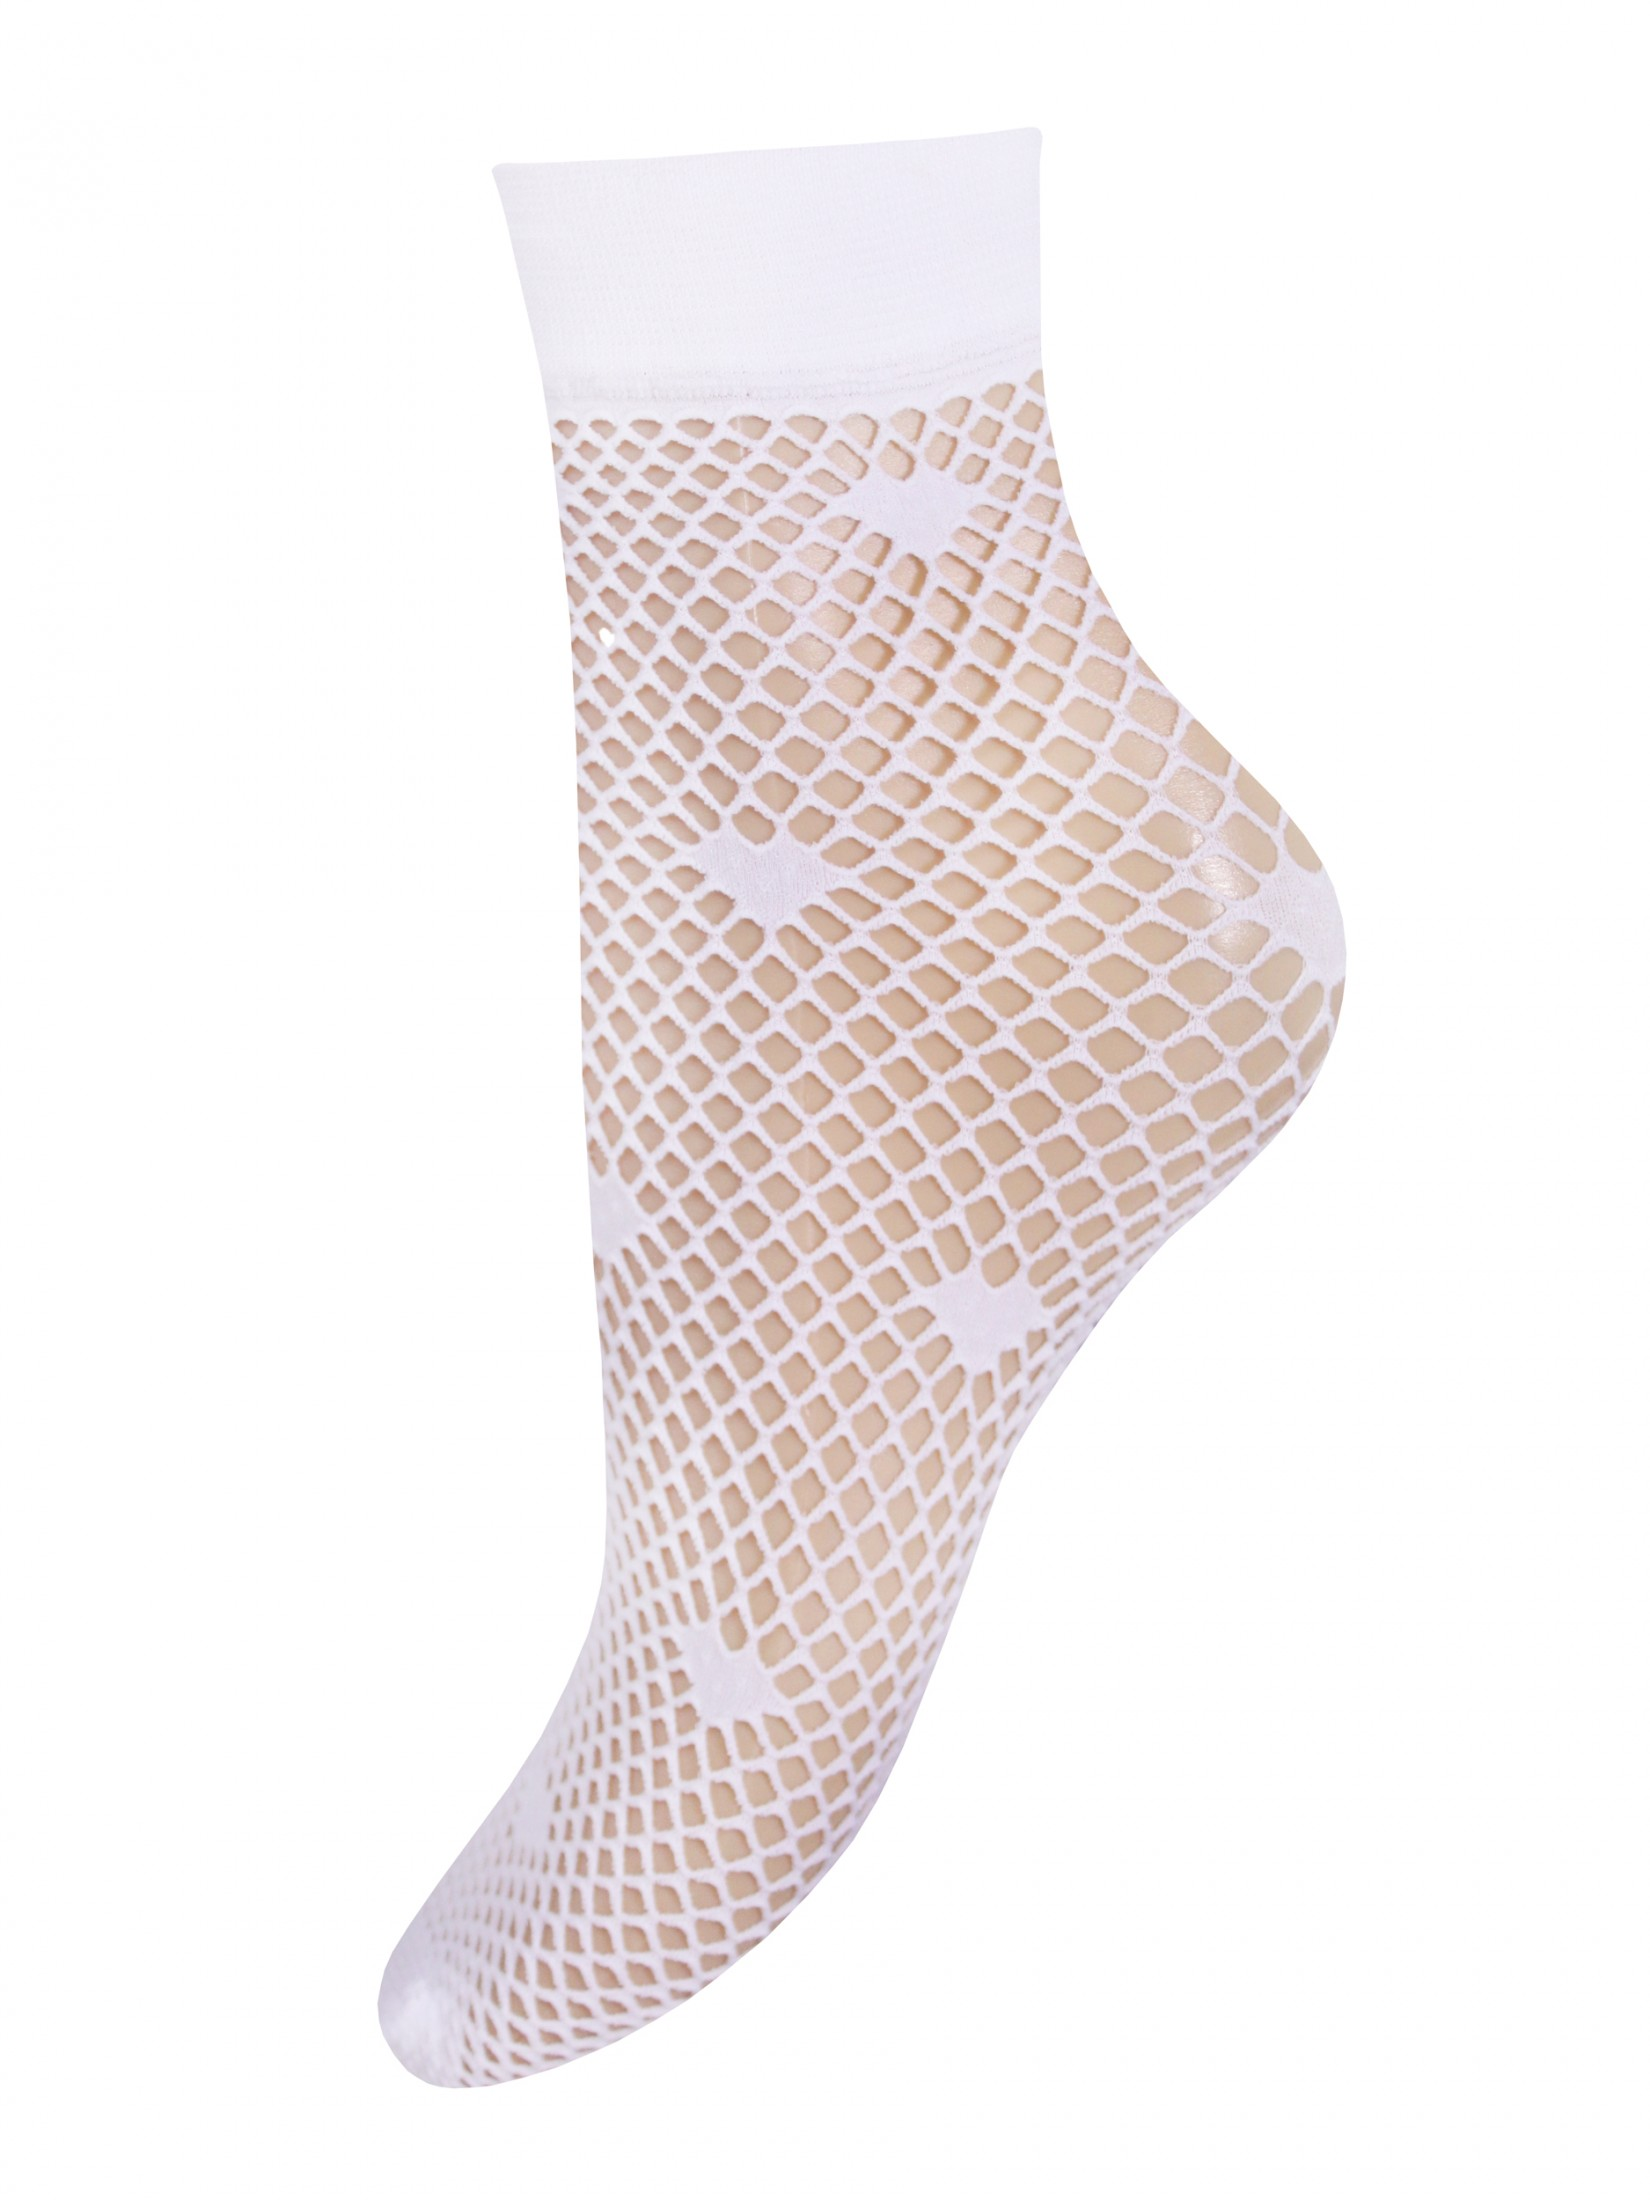 Капроновые носки женские Mademoiselle Dandelion (c.) белые UNICA